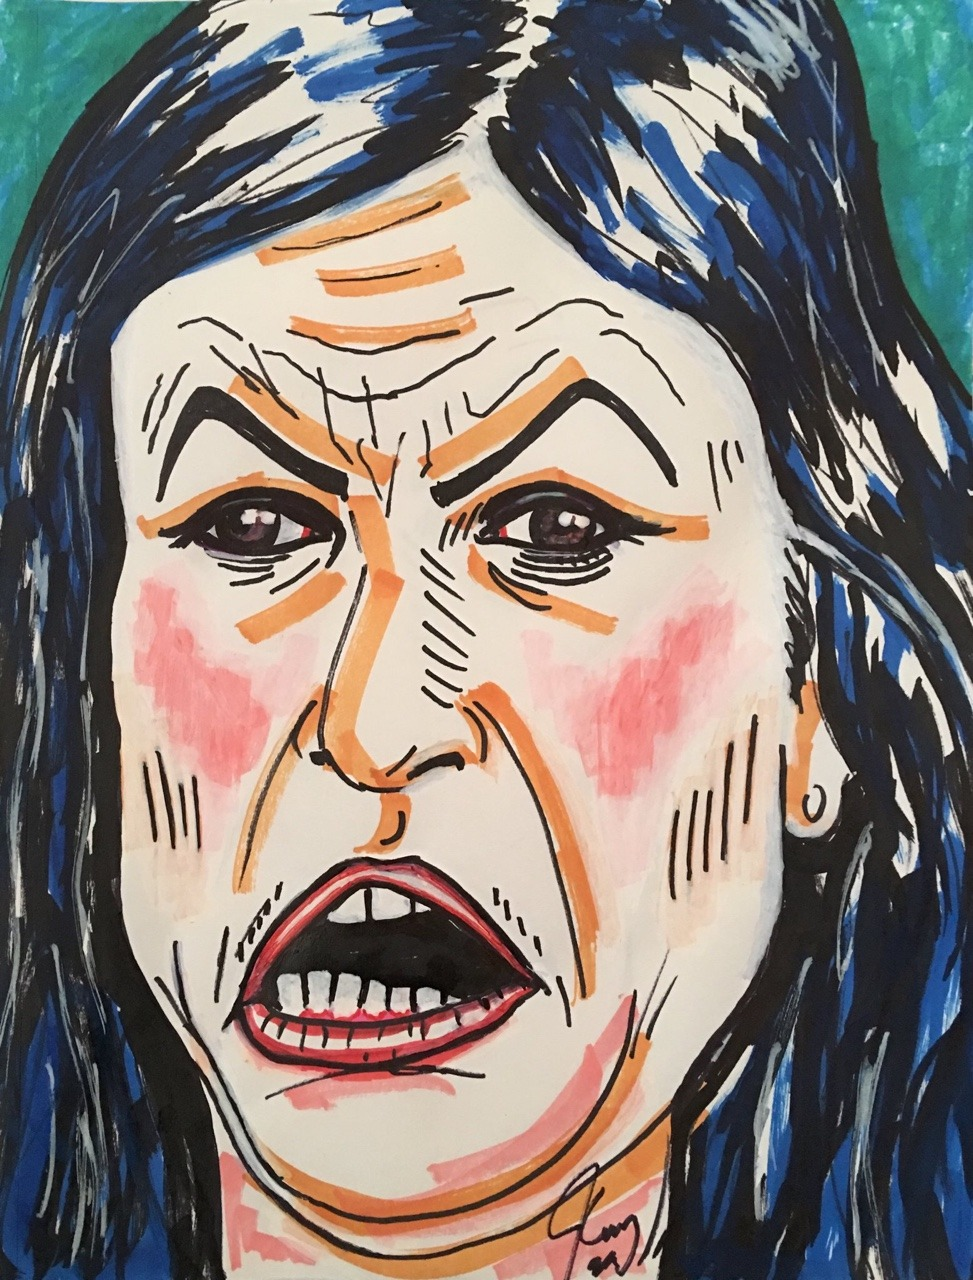 yeahiwasintheshit :    Lol Jim Carrey drew this portrait of Sarah huckabee sanders   Pretty spot on